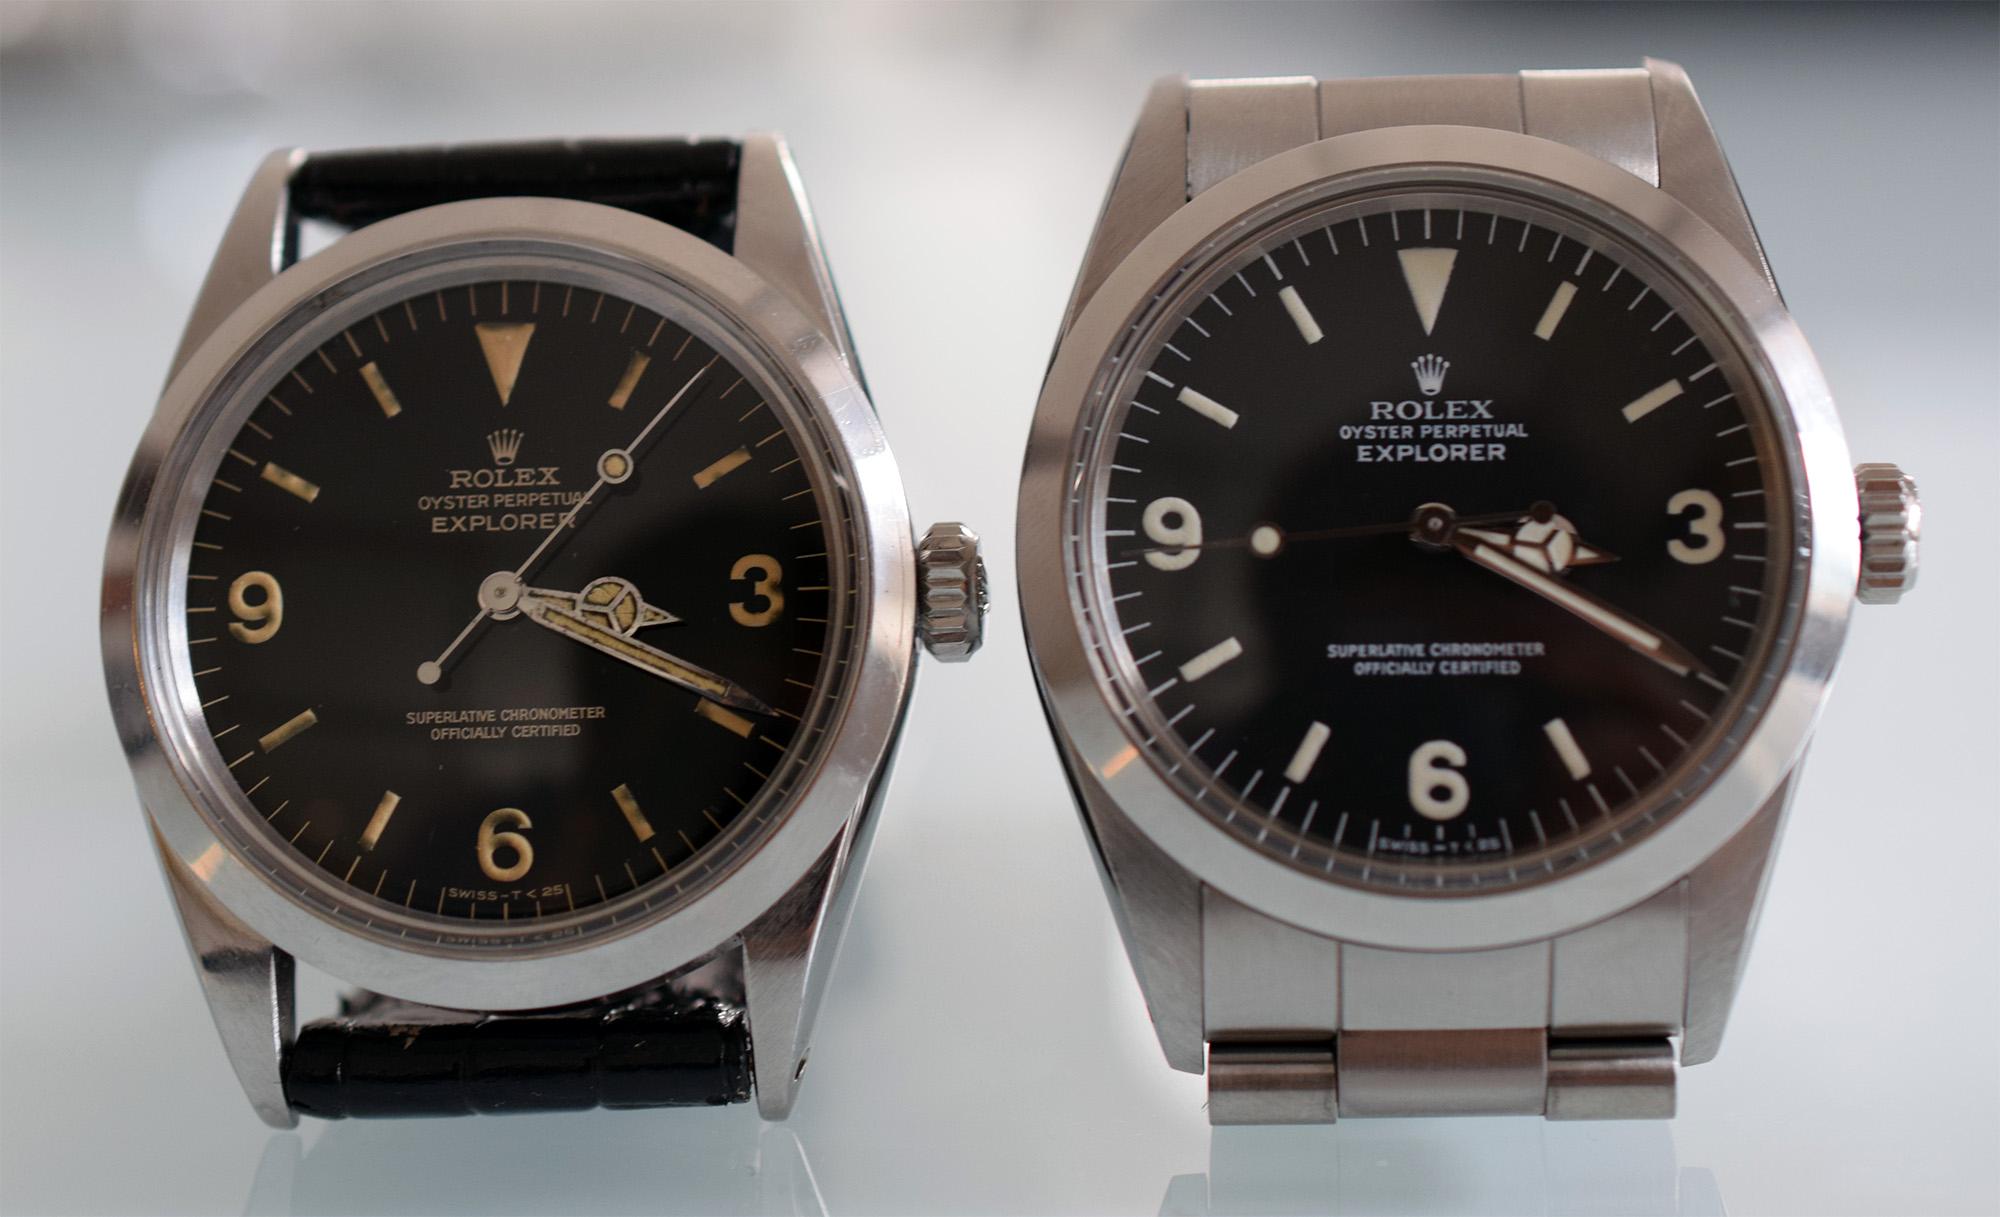 Rolex Explorer Ref. 1016 (1965) and R-series (1987)